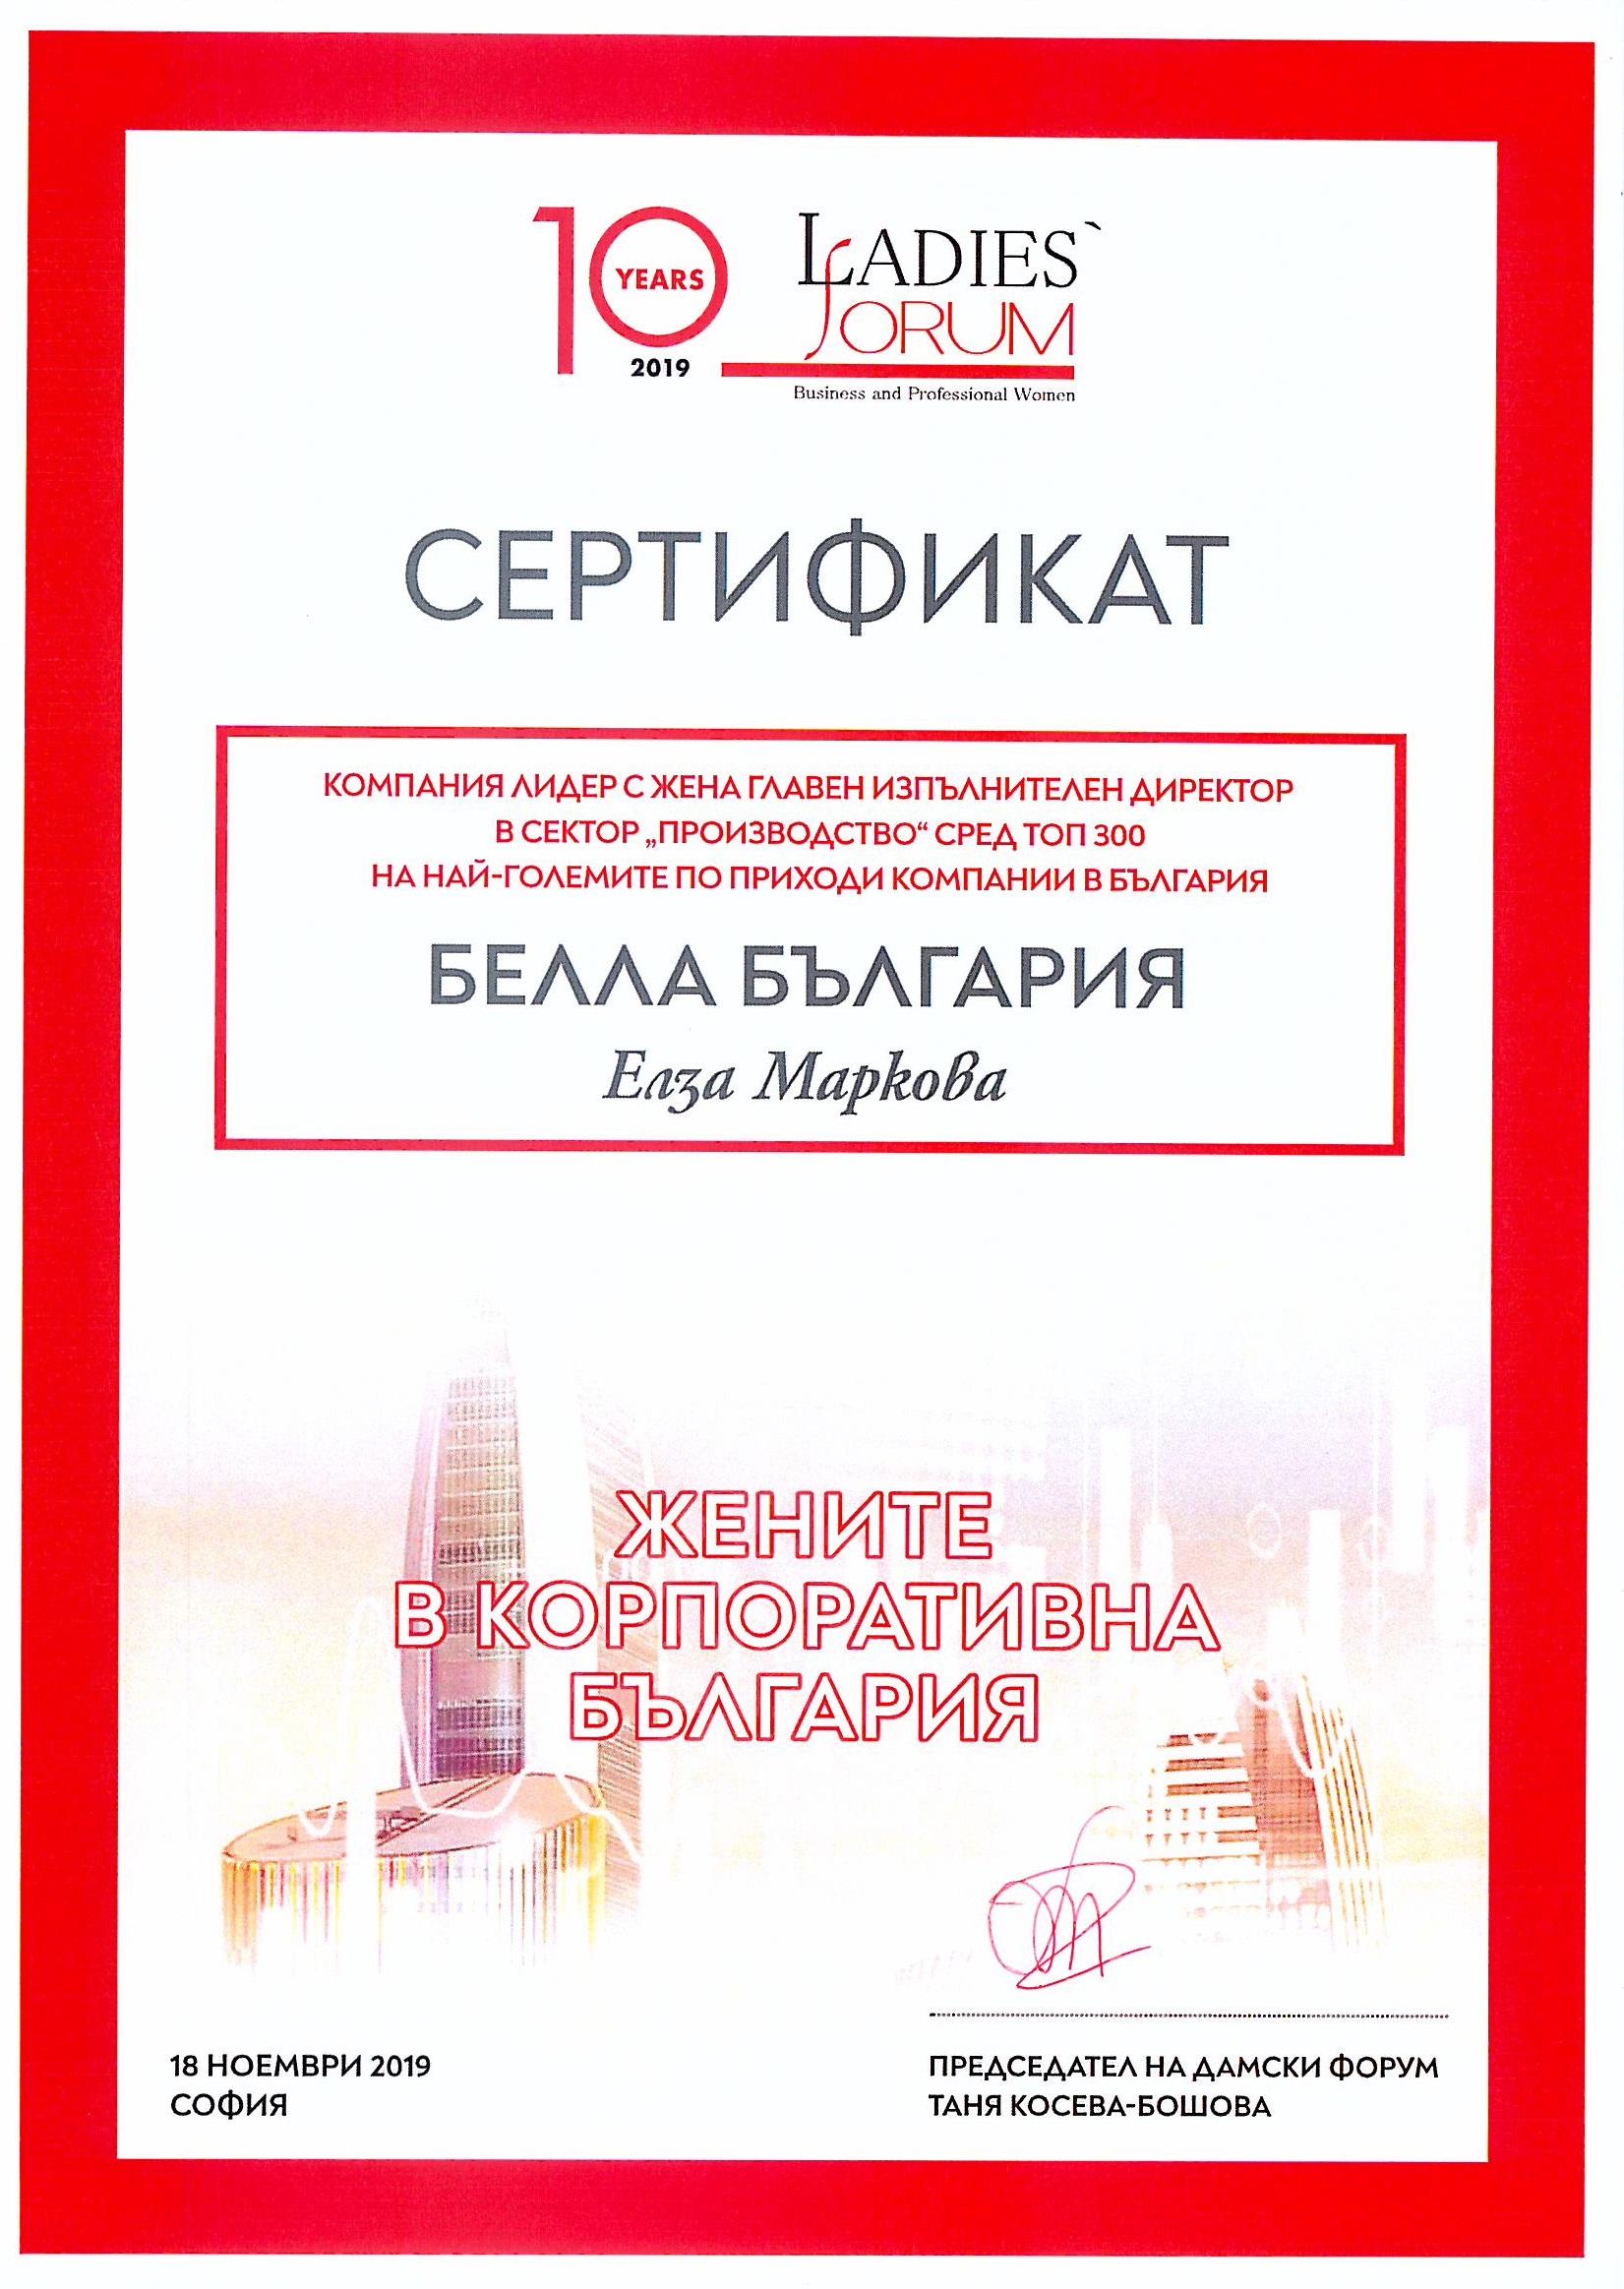 Elza Markova with the award of the Women's Forum, 2019